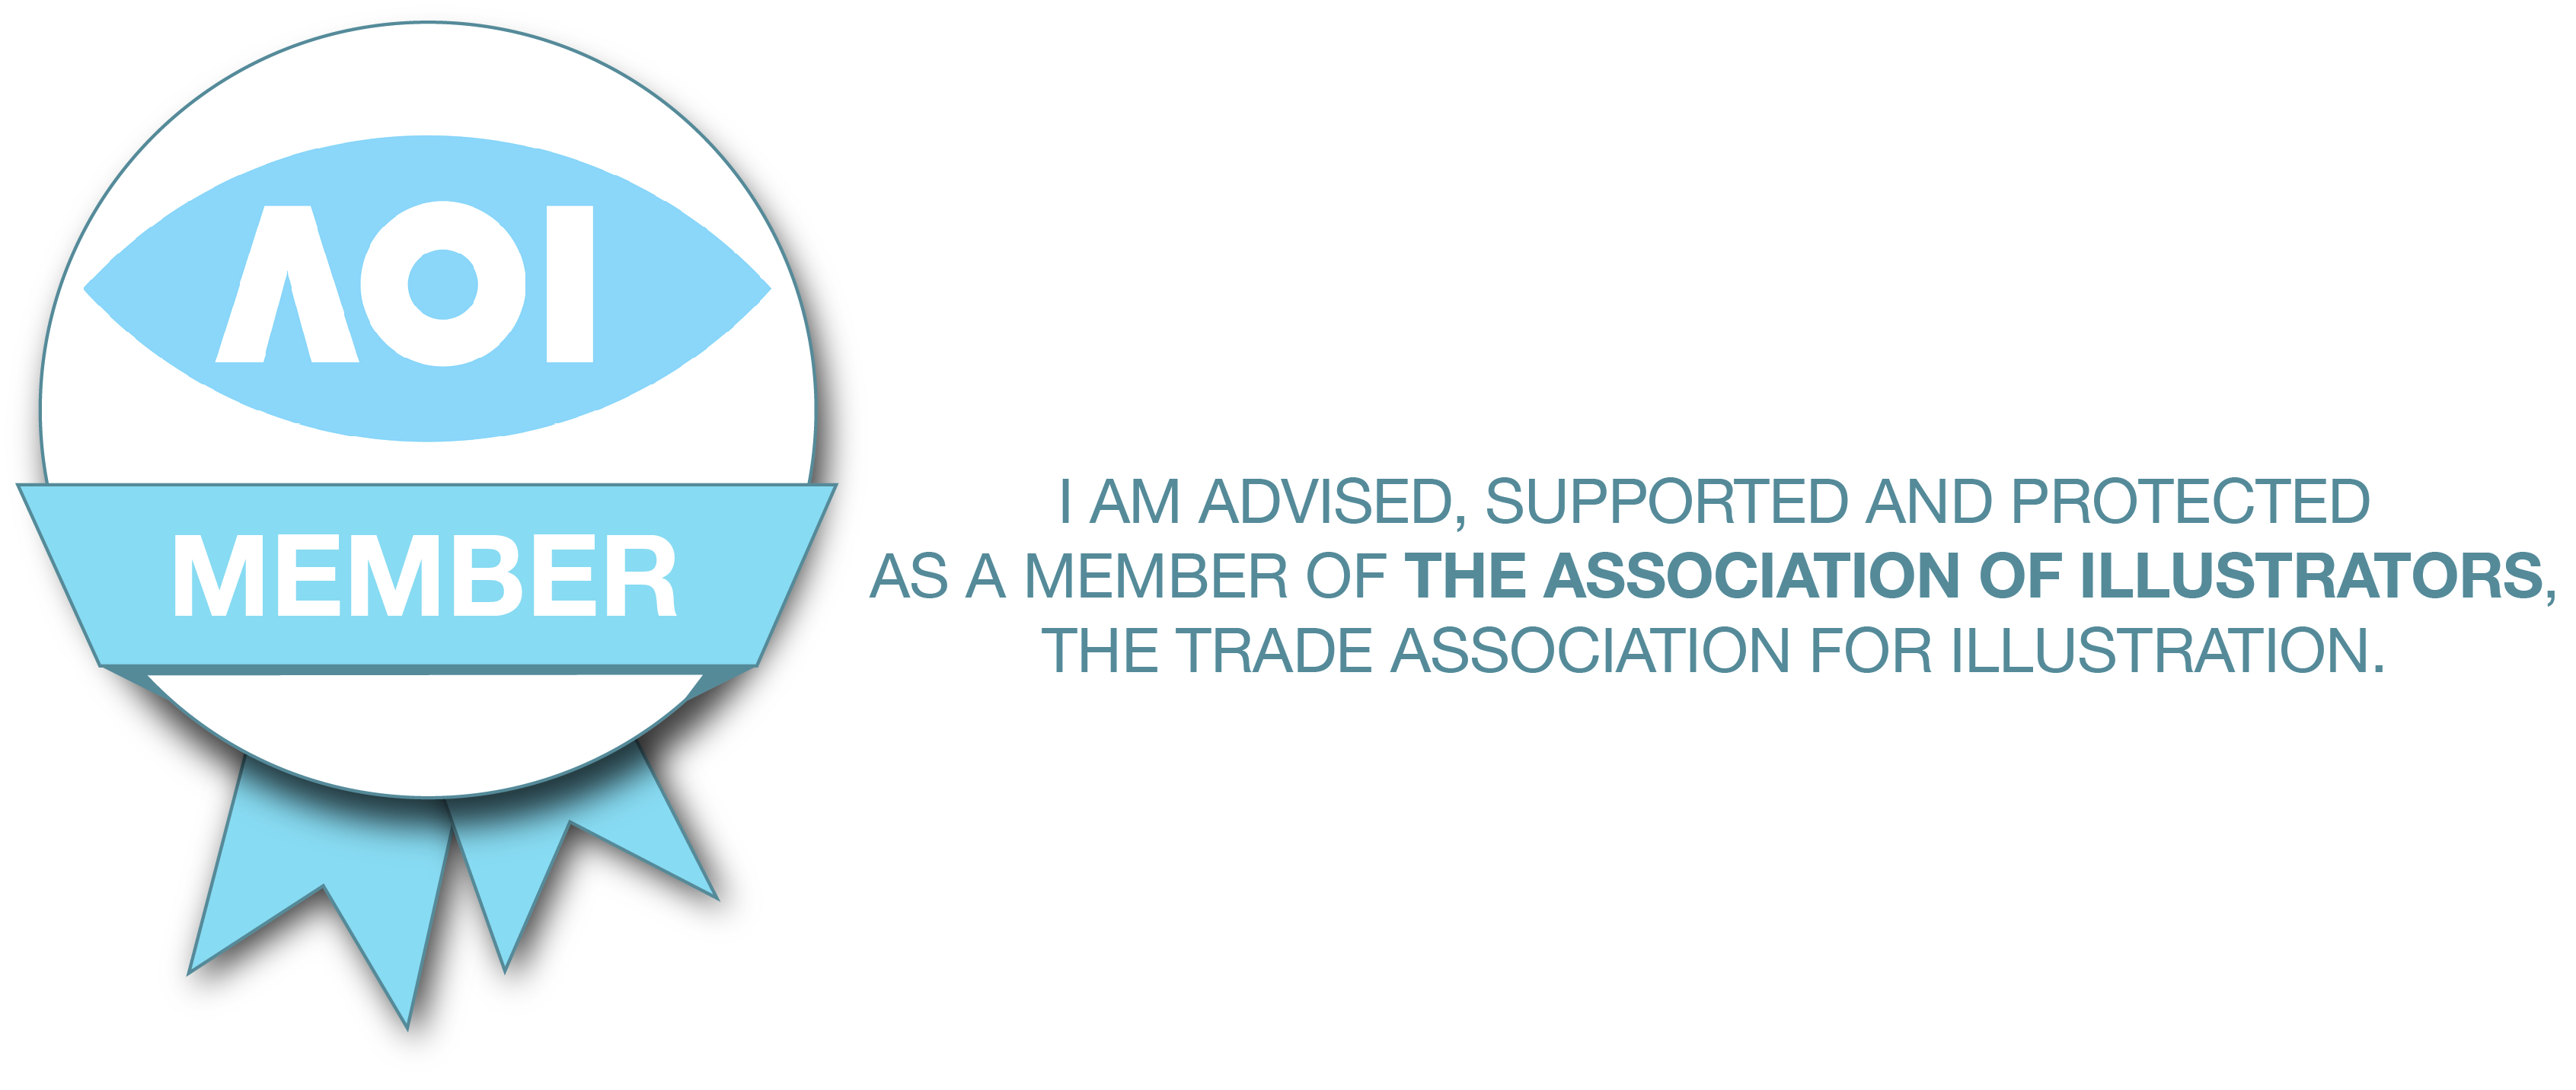 AOI Member Logo and Text